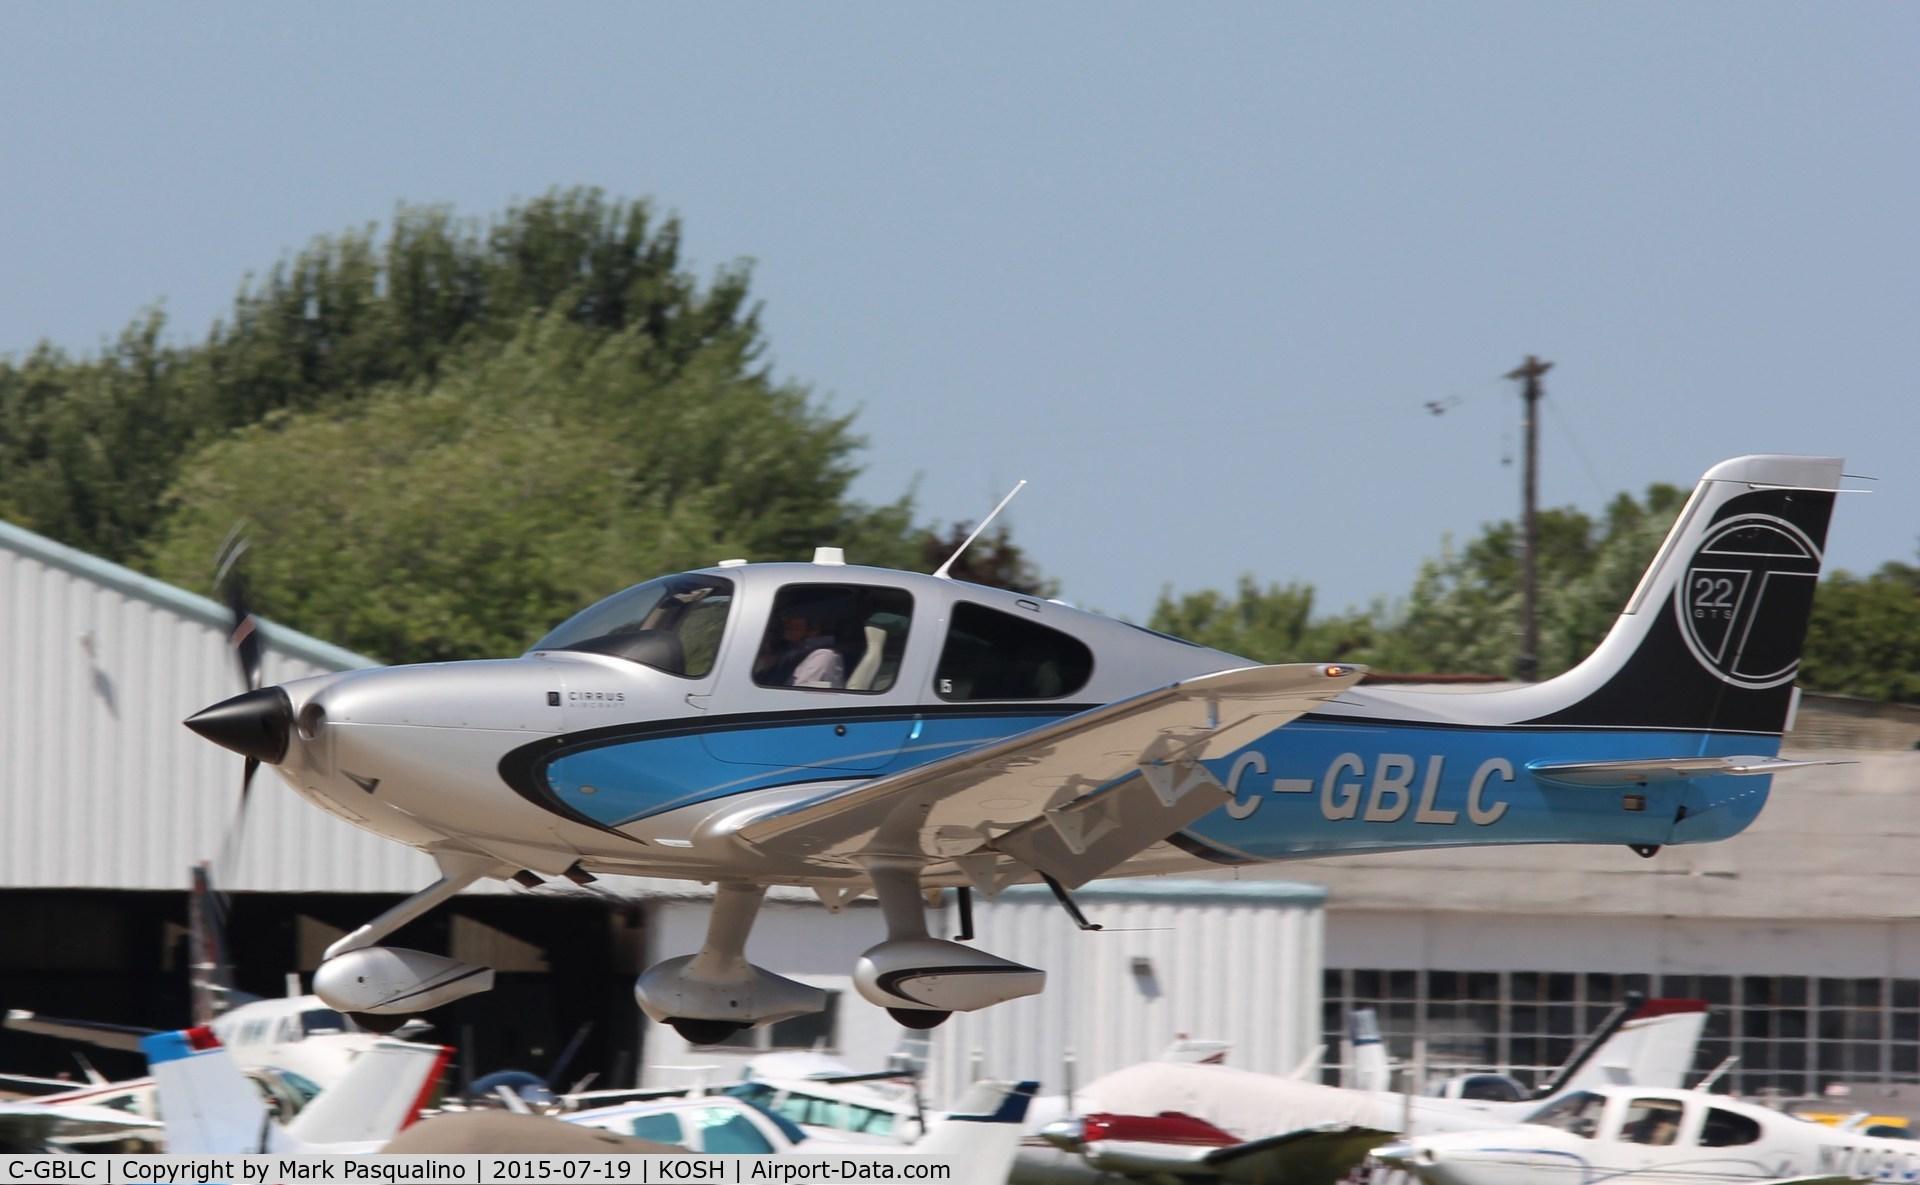 C-GBLC, 2013 Cirrus SR22T C/N 0659, Cirrus SR22T